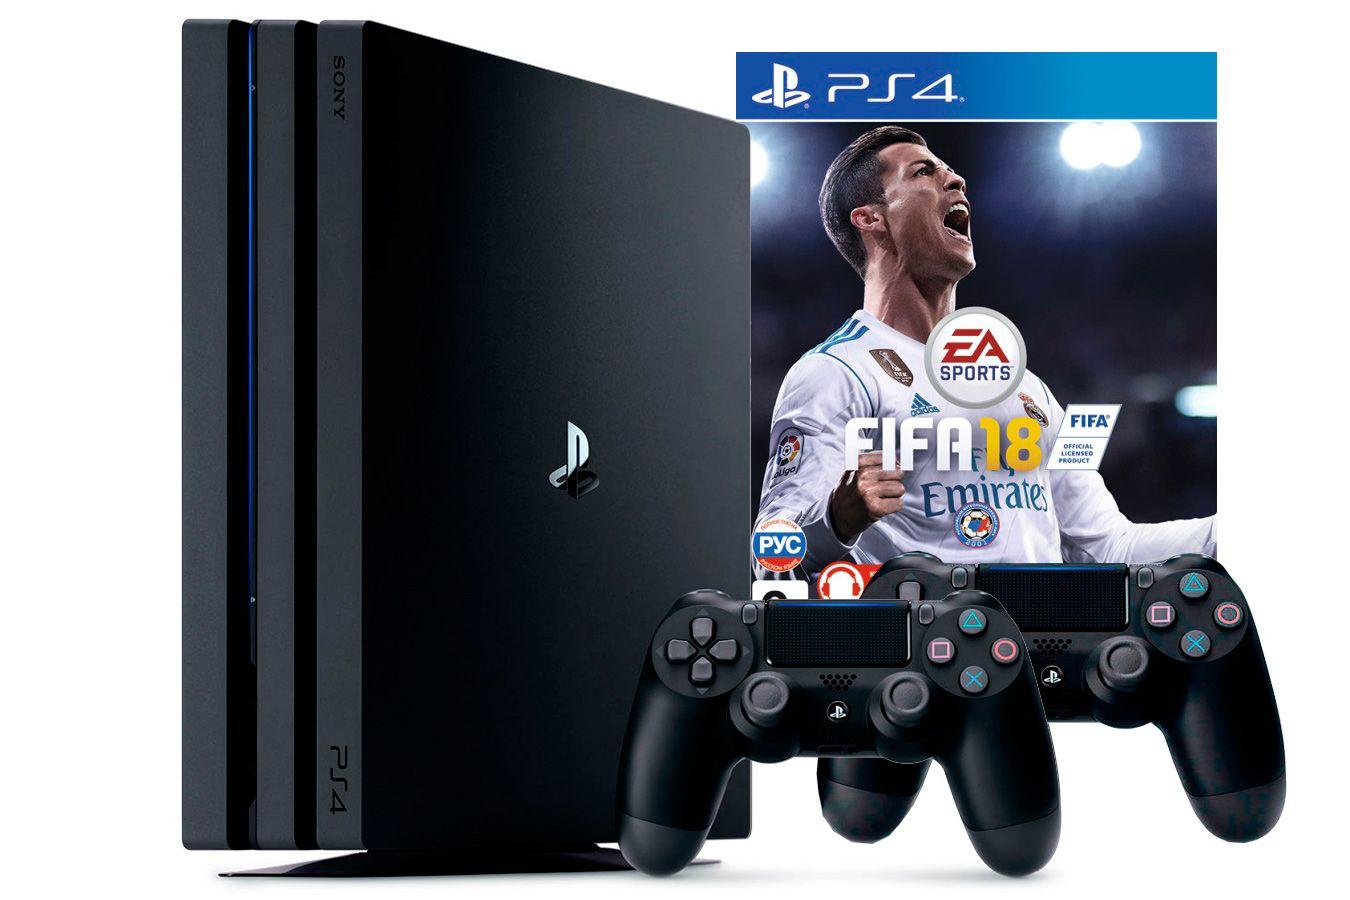 PlayStation 4 Pro 2 джойстика, приставка и игра FIFA 18 [PS4P1J2F18]